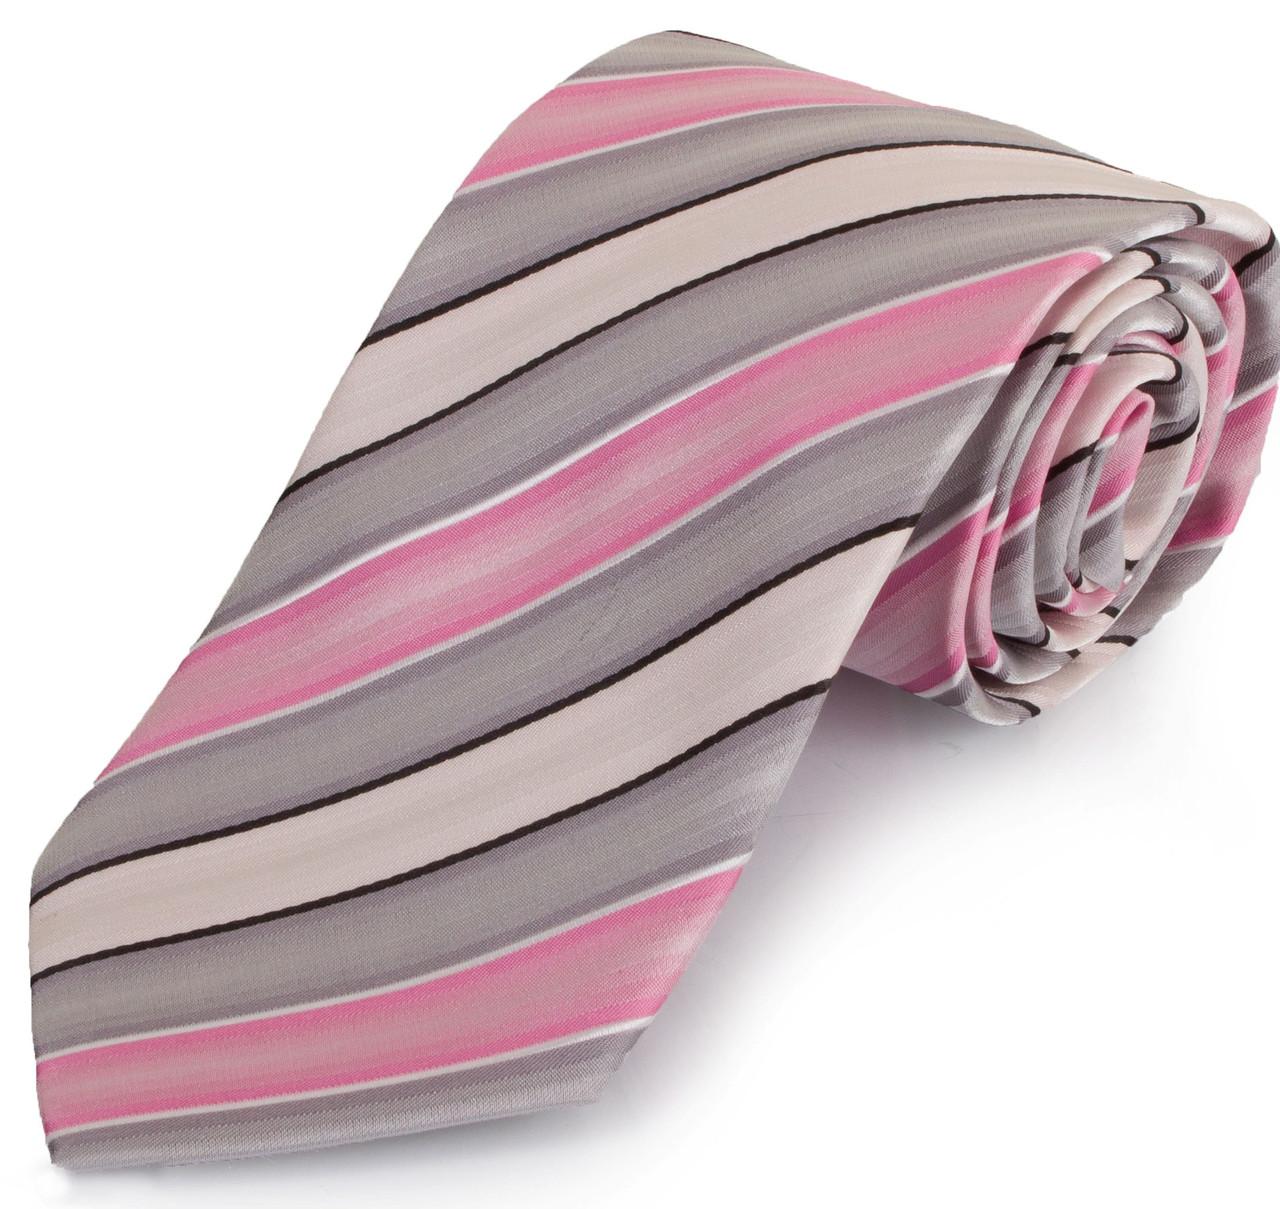 Різнобарвний чоловічий широкий галстук SCHONAU & HOUCKEN (ШЕНАУ & ХОЙКЕН) FAREPS-58